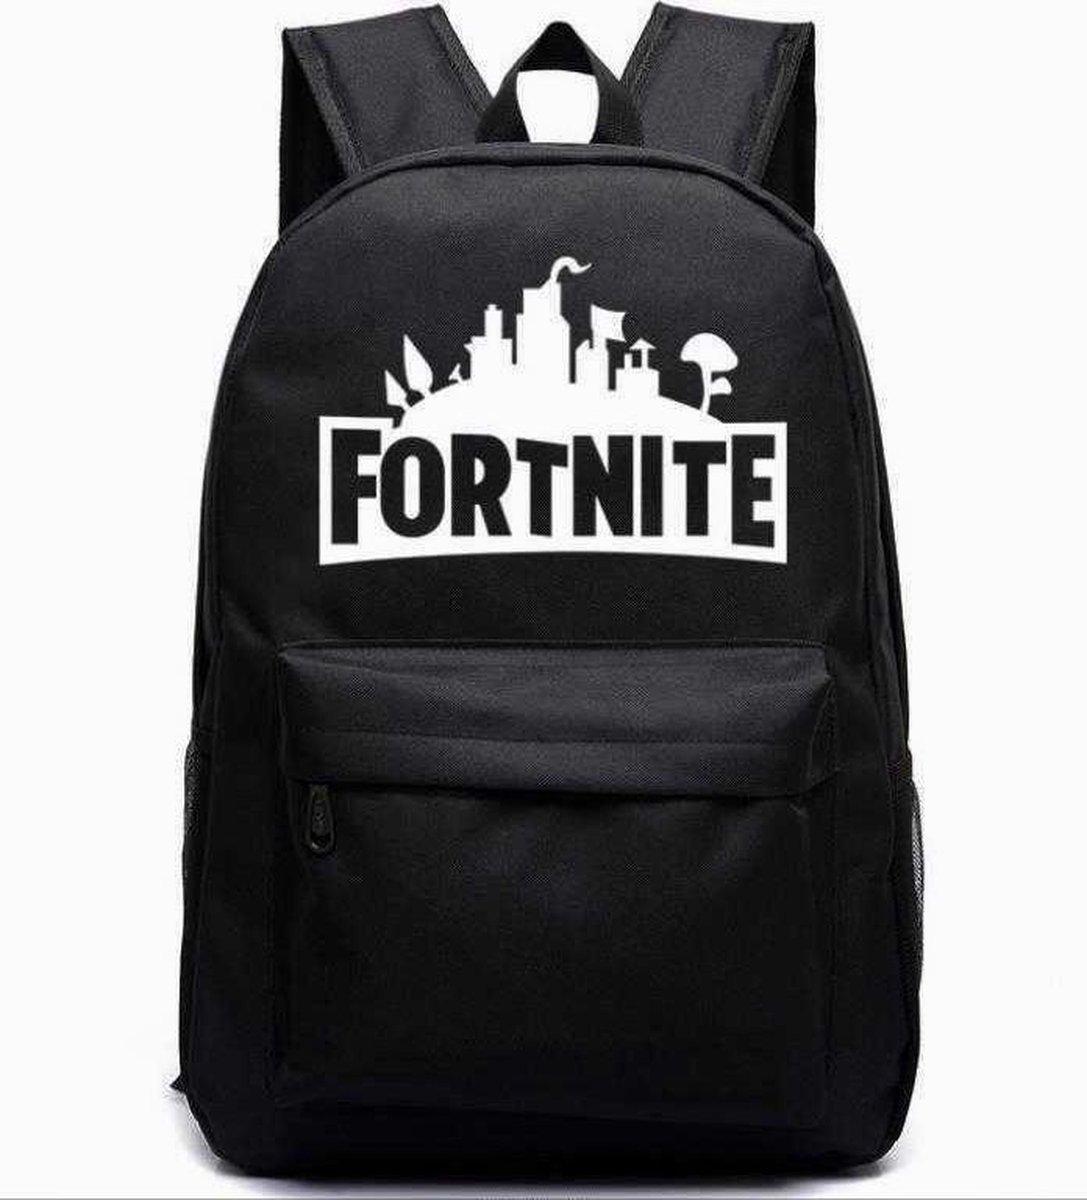 Fortnite - Fortnite Rugtas - Rugzak - Schooltas